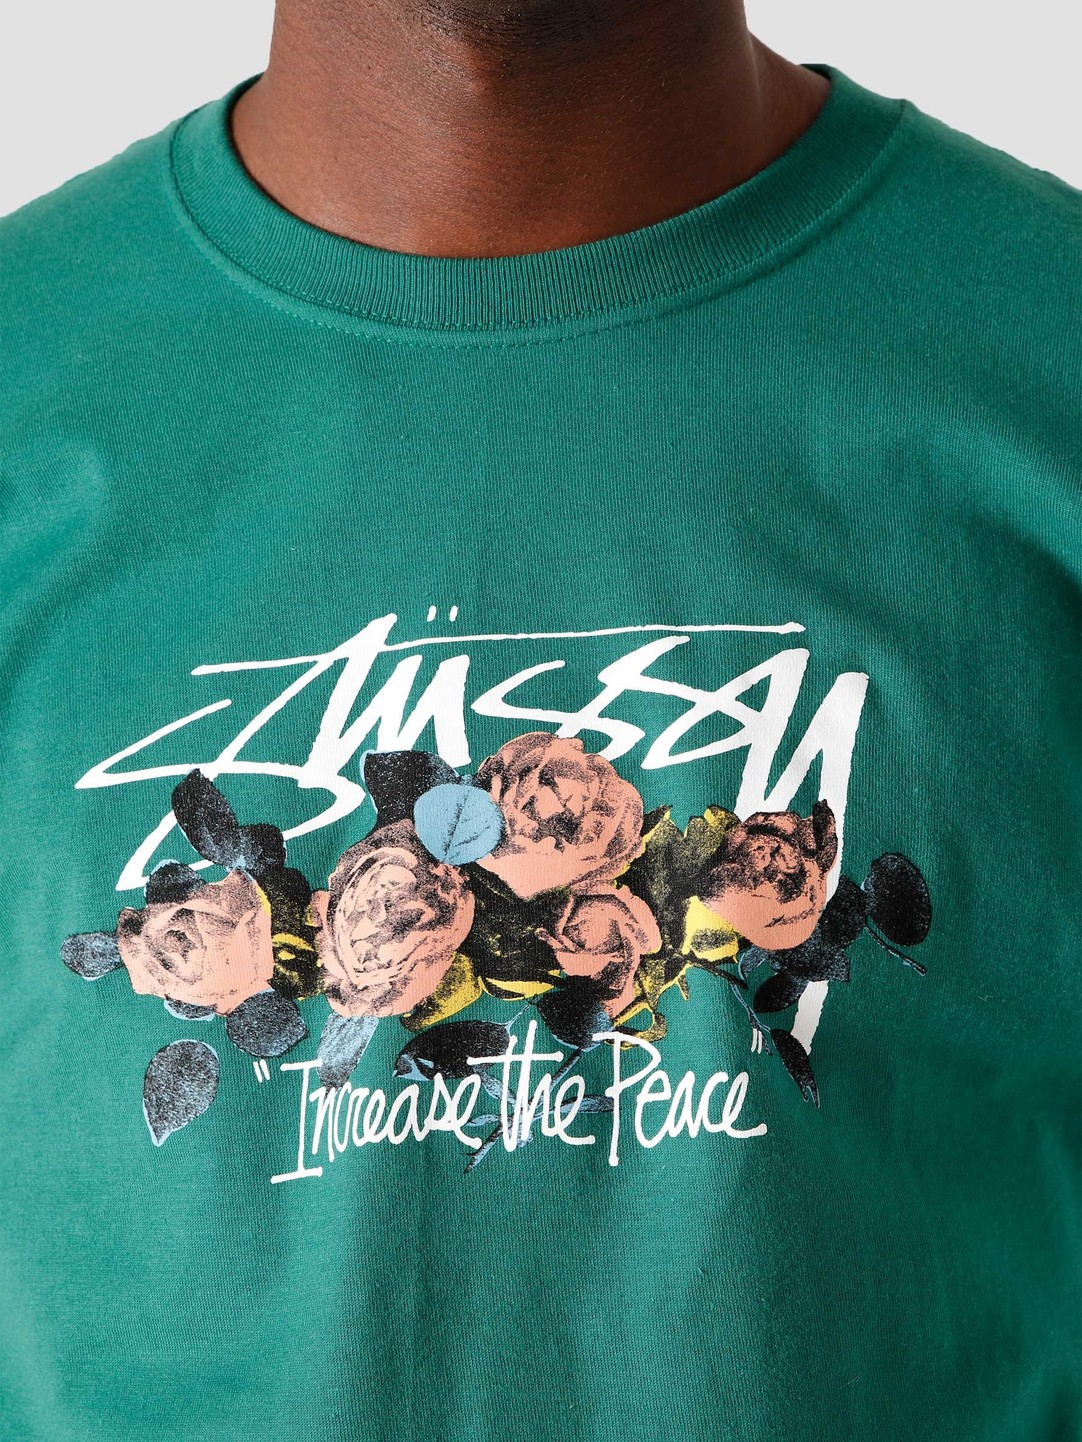 Stussy Stussy LTP Roses T-Shirt Dark Green 1904574-0450